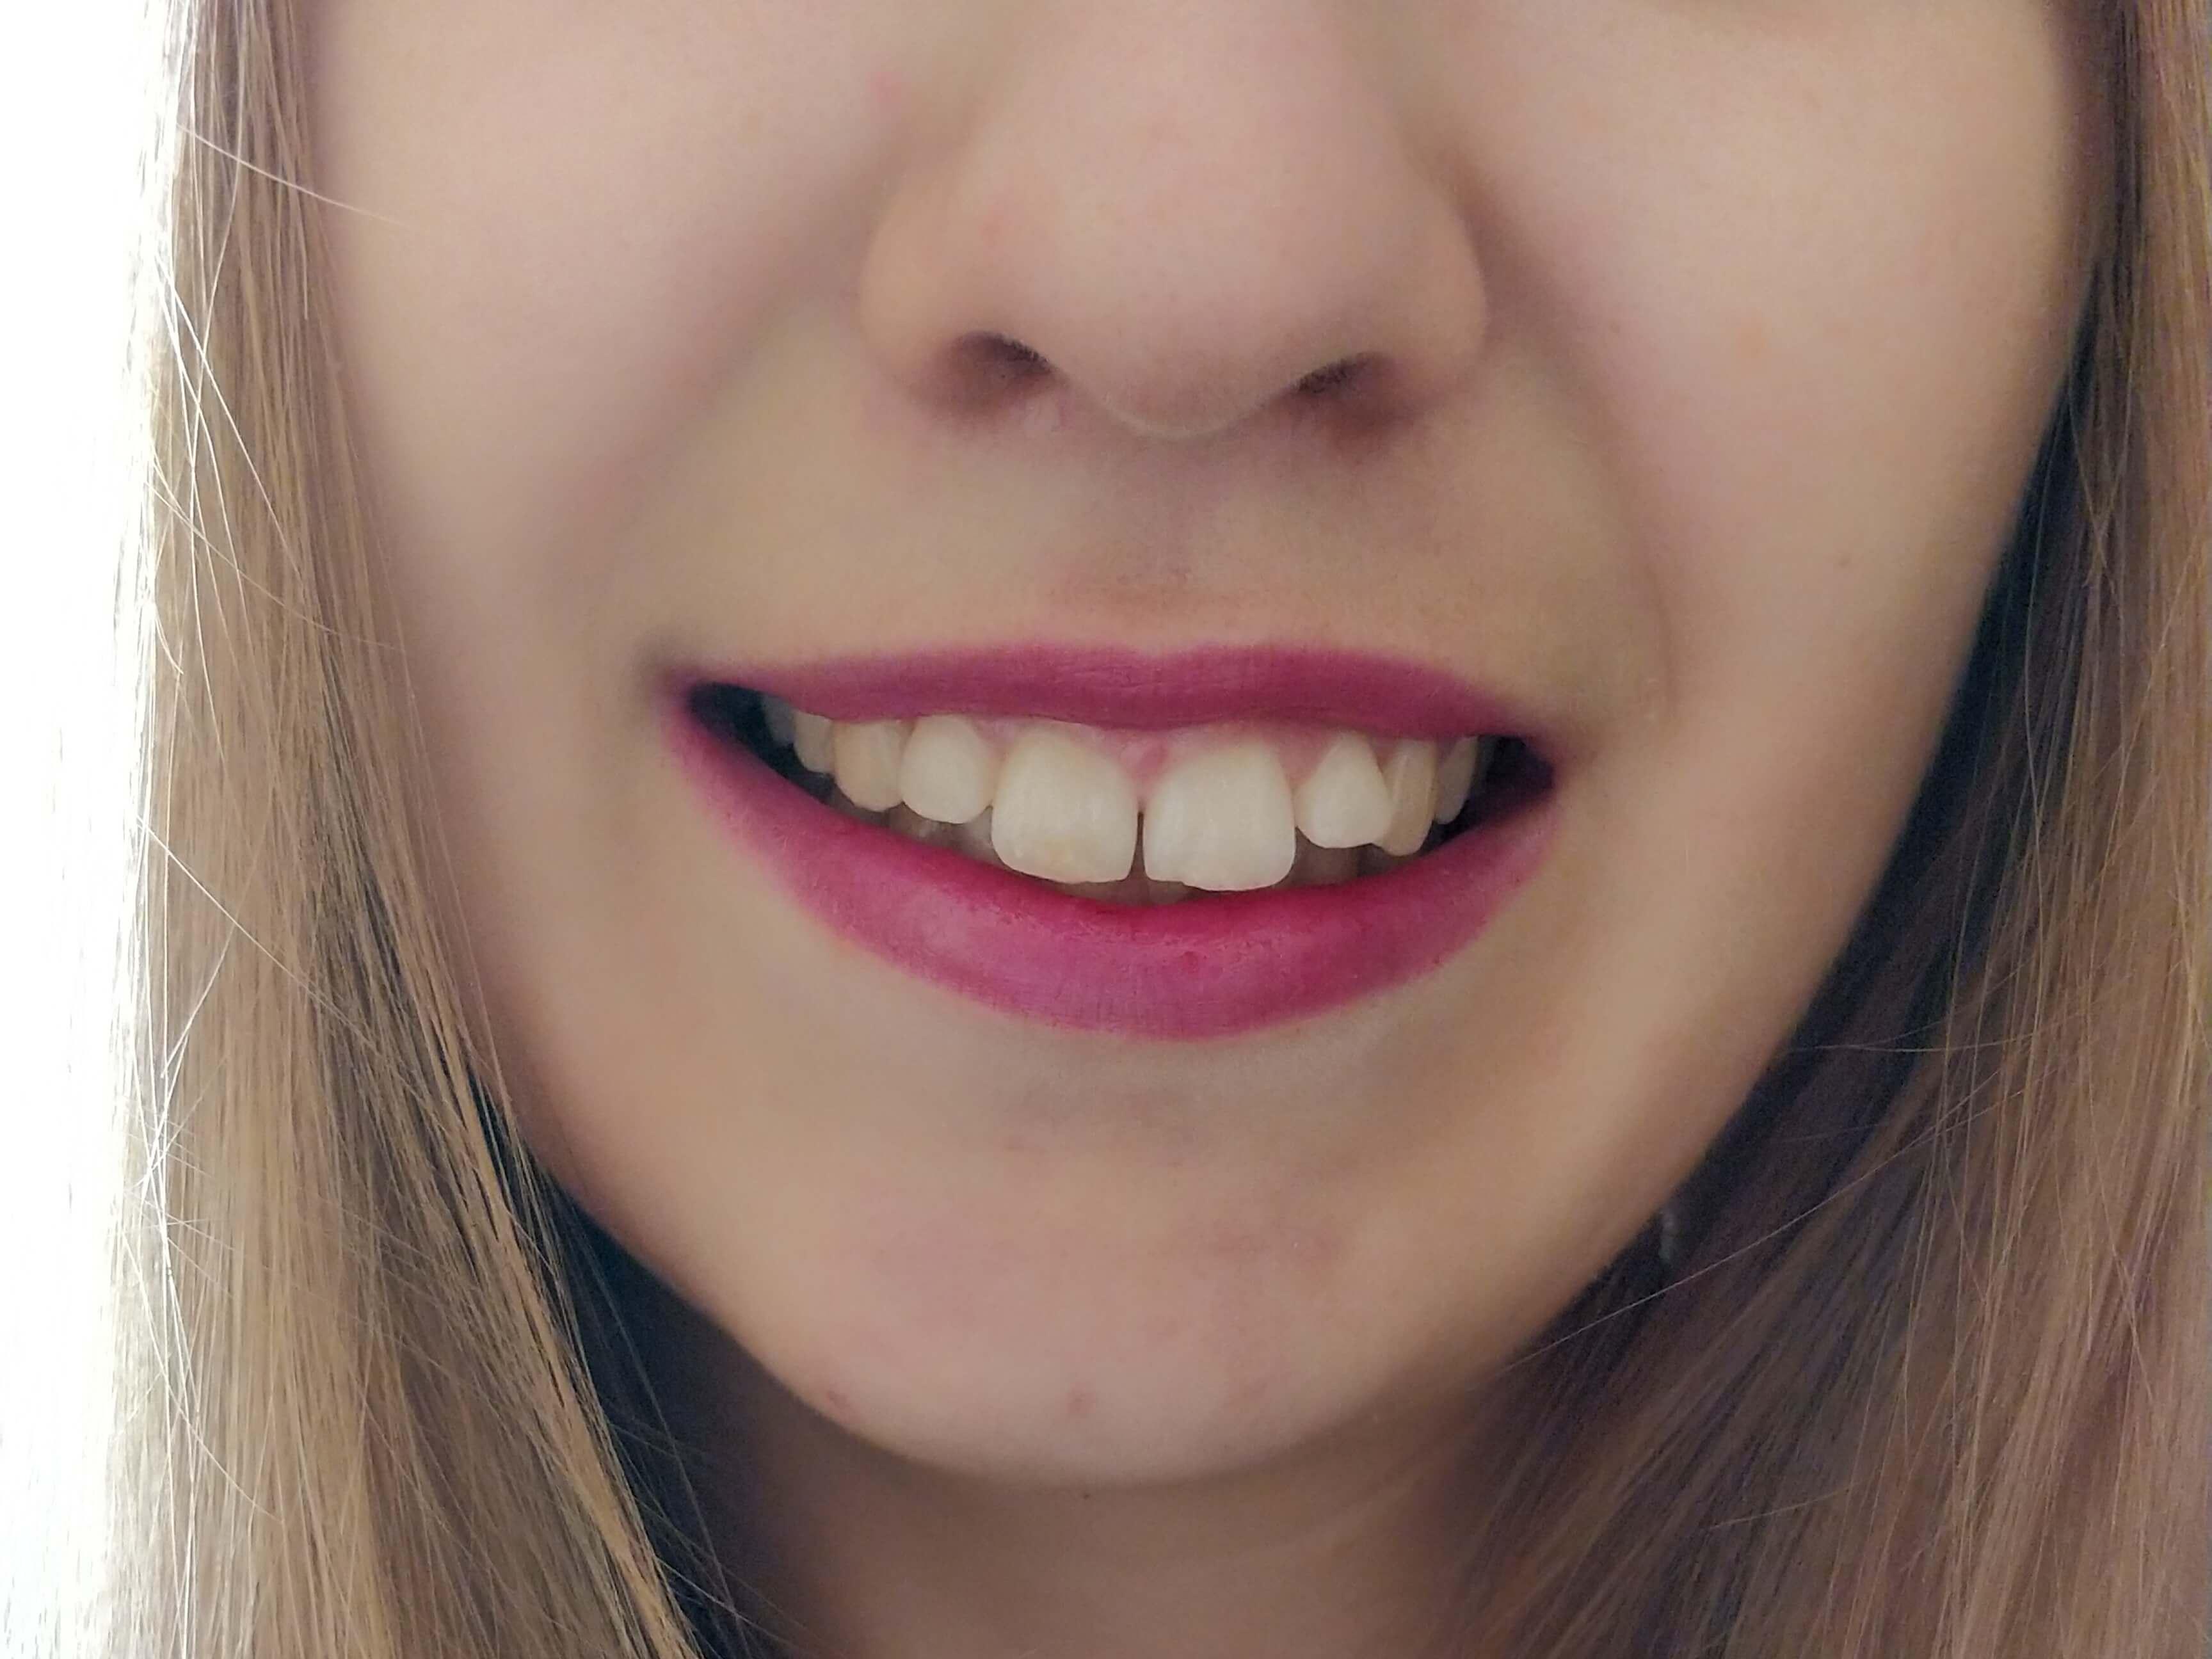 redresser dents appareil dentaire adulte - Porter un appareil dentaire quand on est adulte